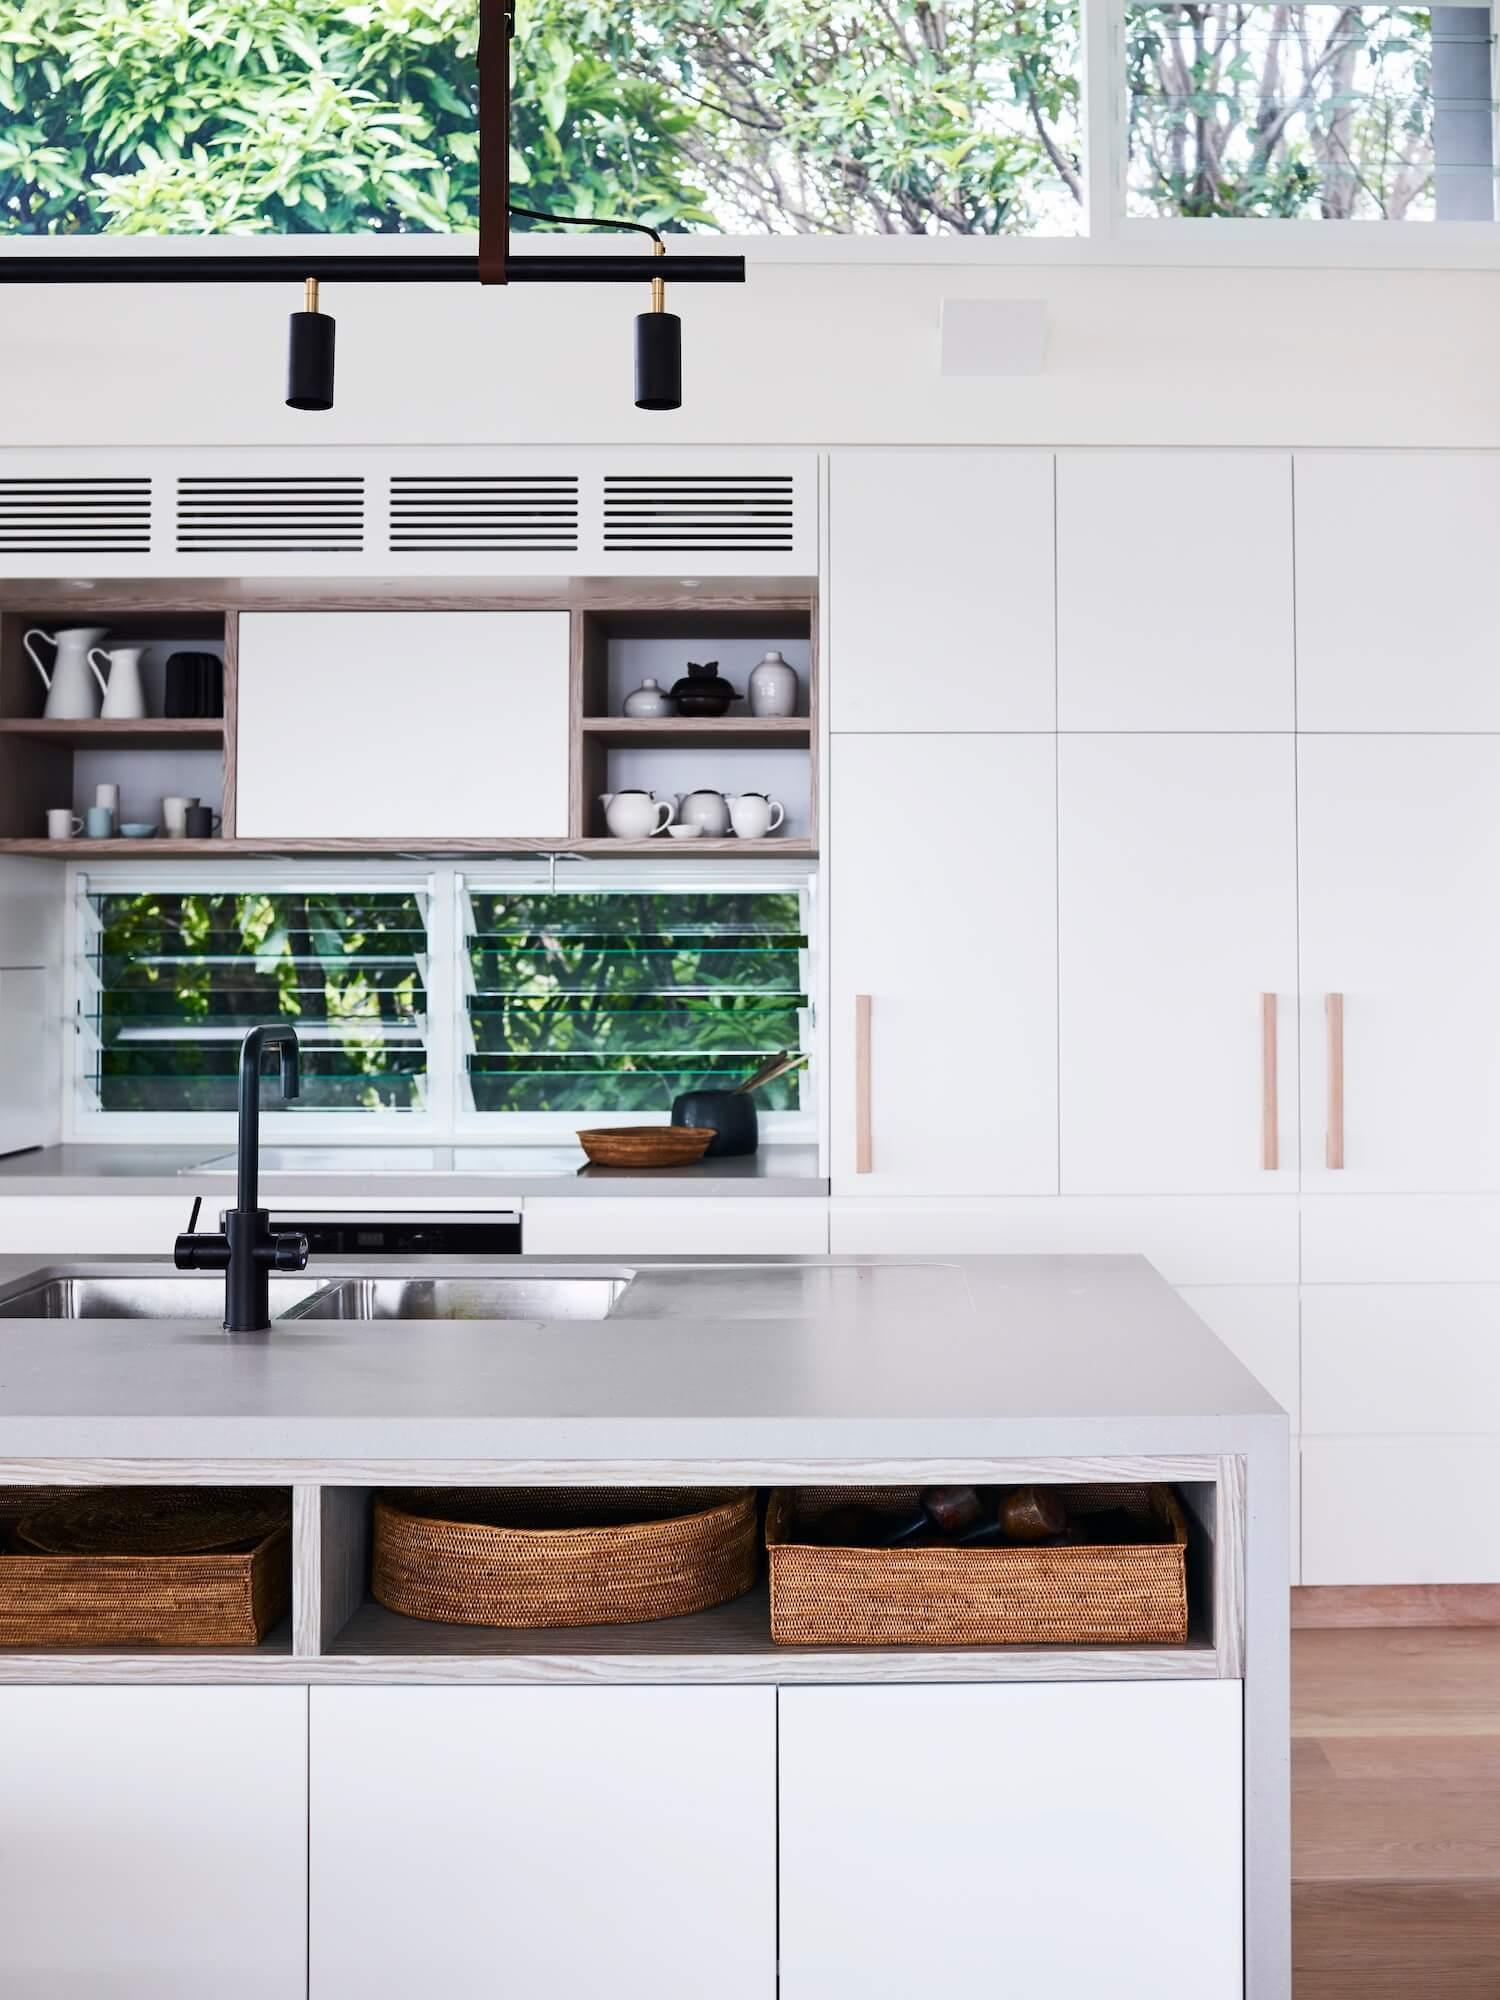 est living interiors ayindi corben architects 8